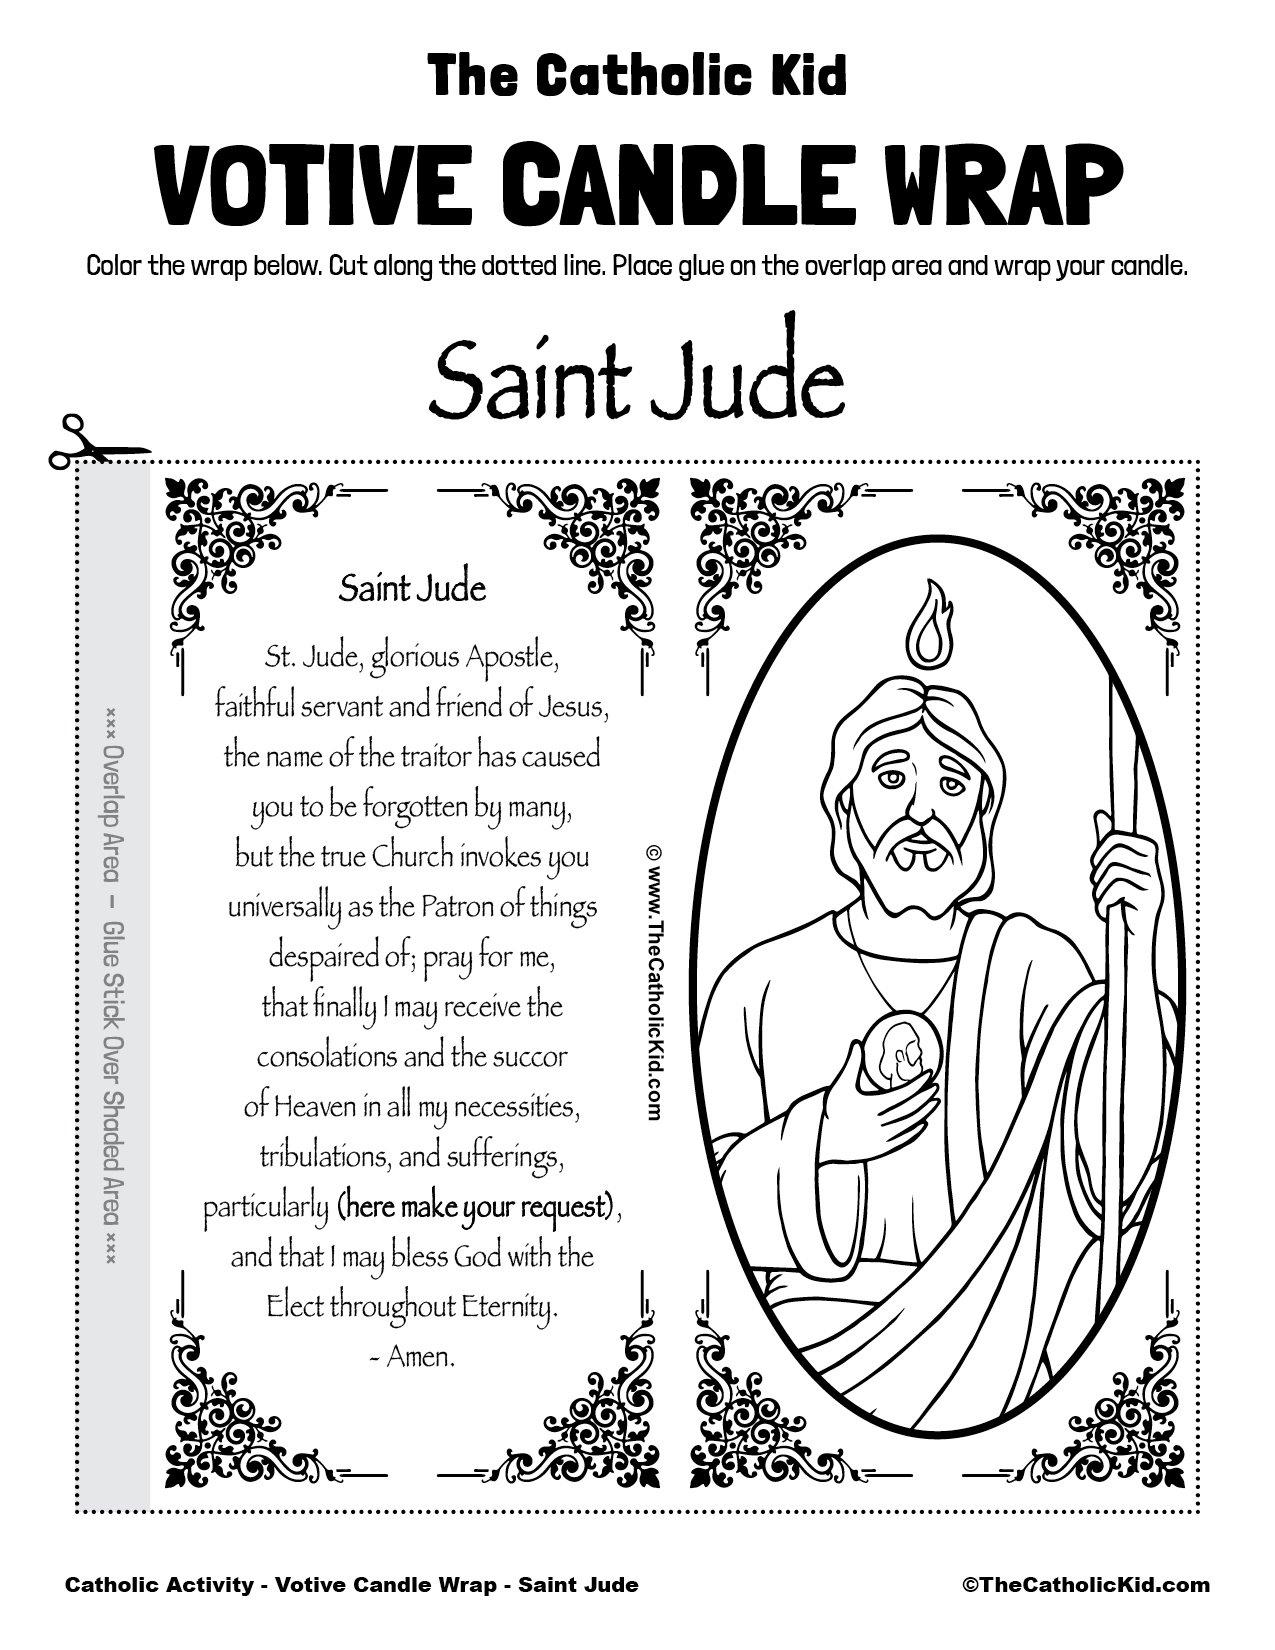 Free Printable Catholic Votive Candle Wrap Coloring Page Saint Jude